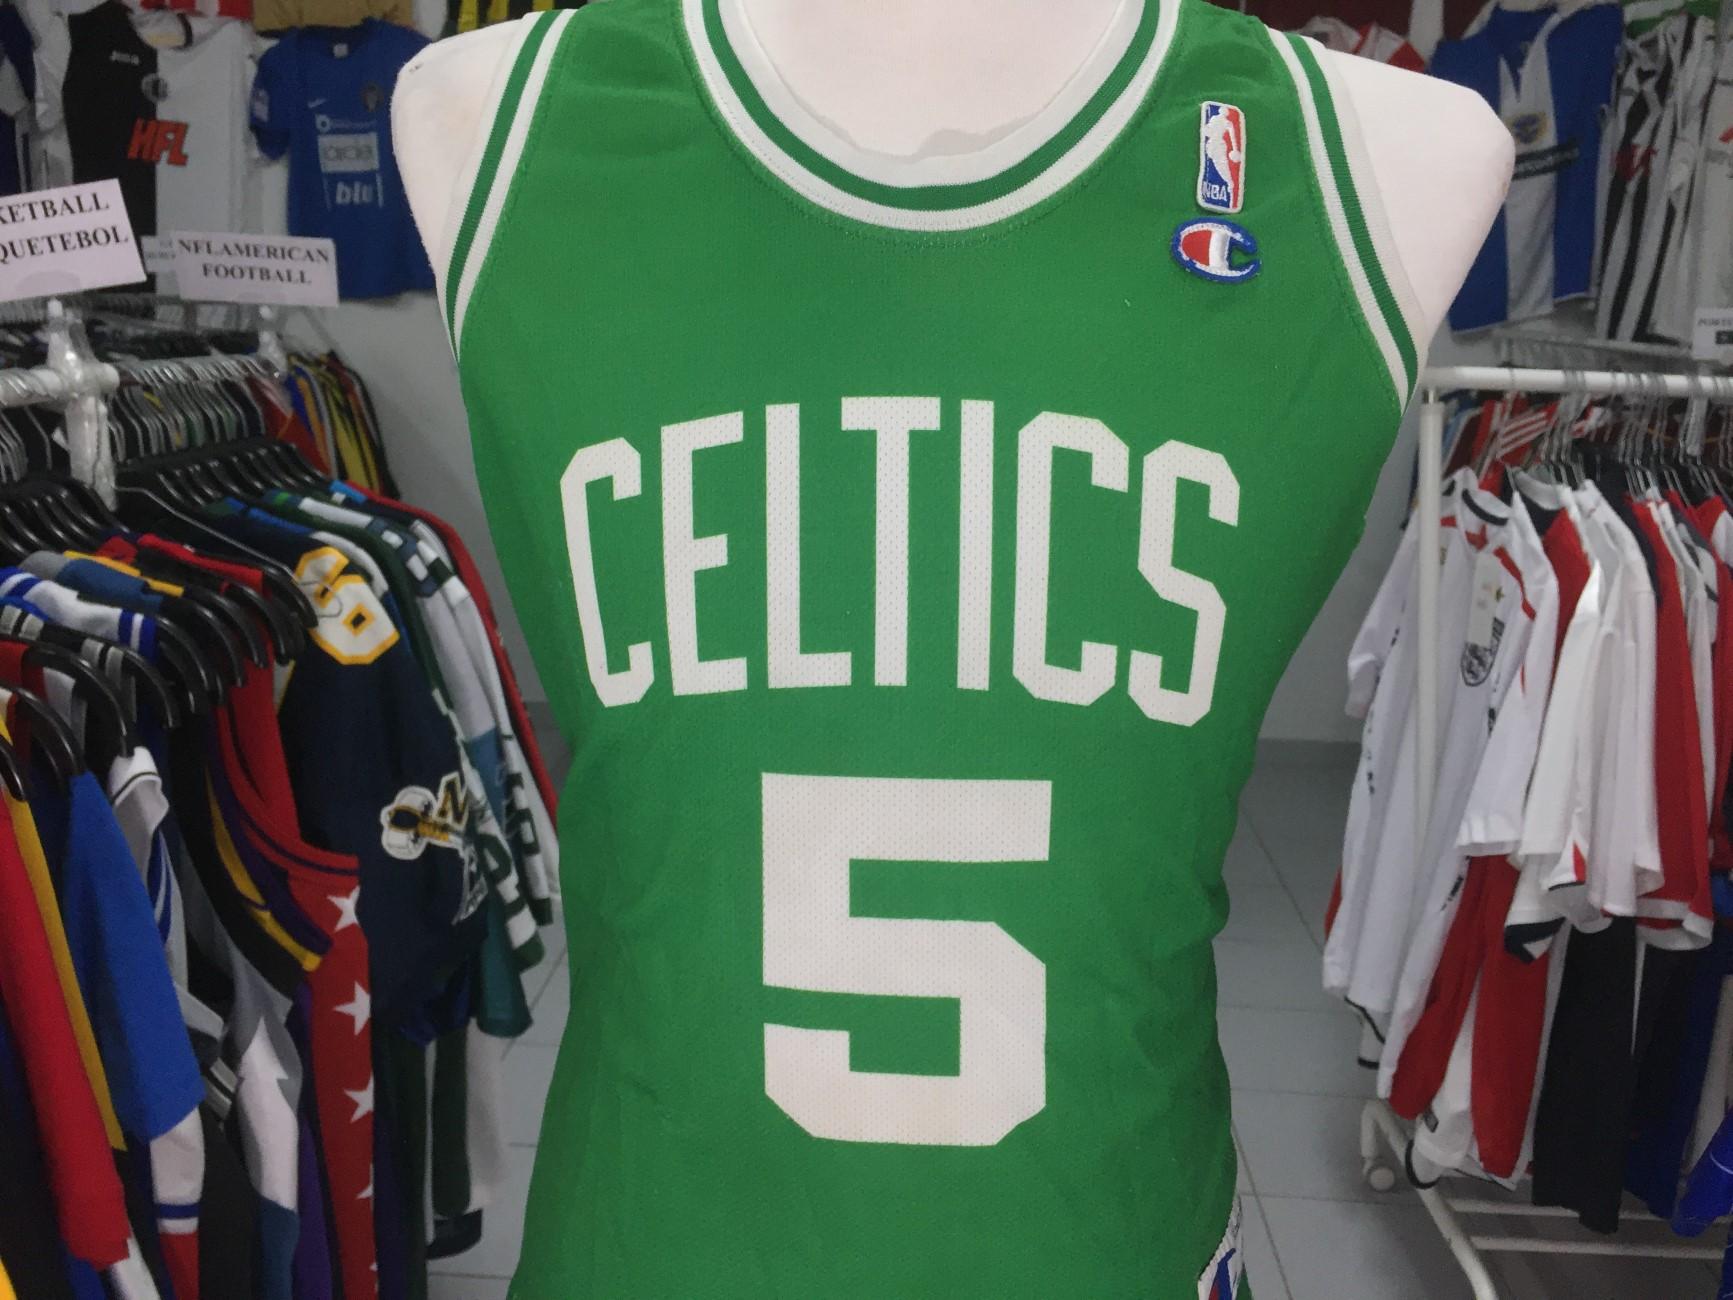 7a598552a5b4 Boston Celtics Home Jersey (S) 5 Garnett NBA Shirt Champion Camisola ...